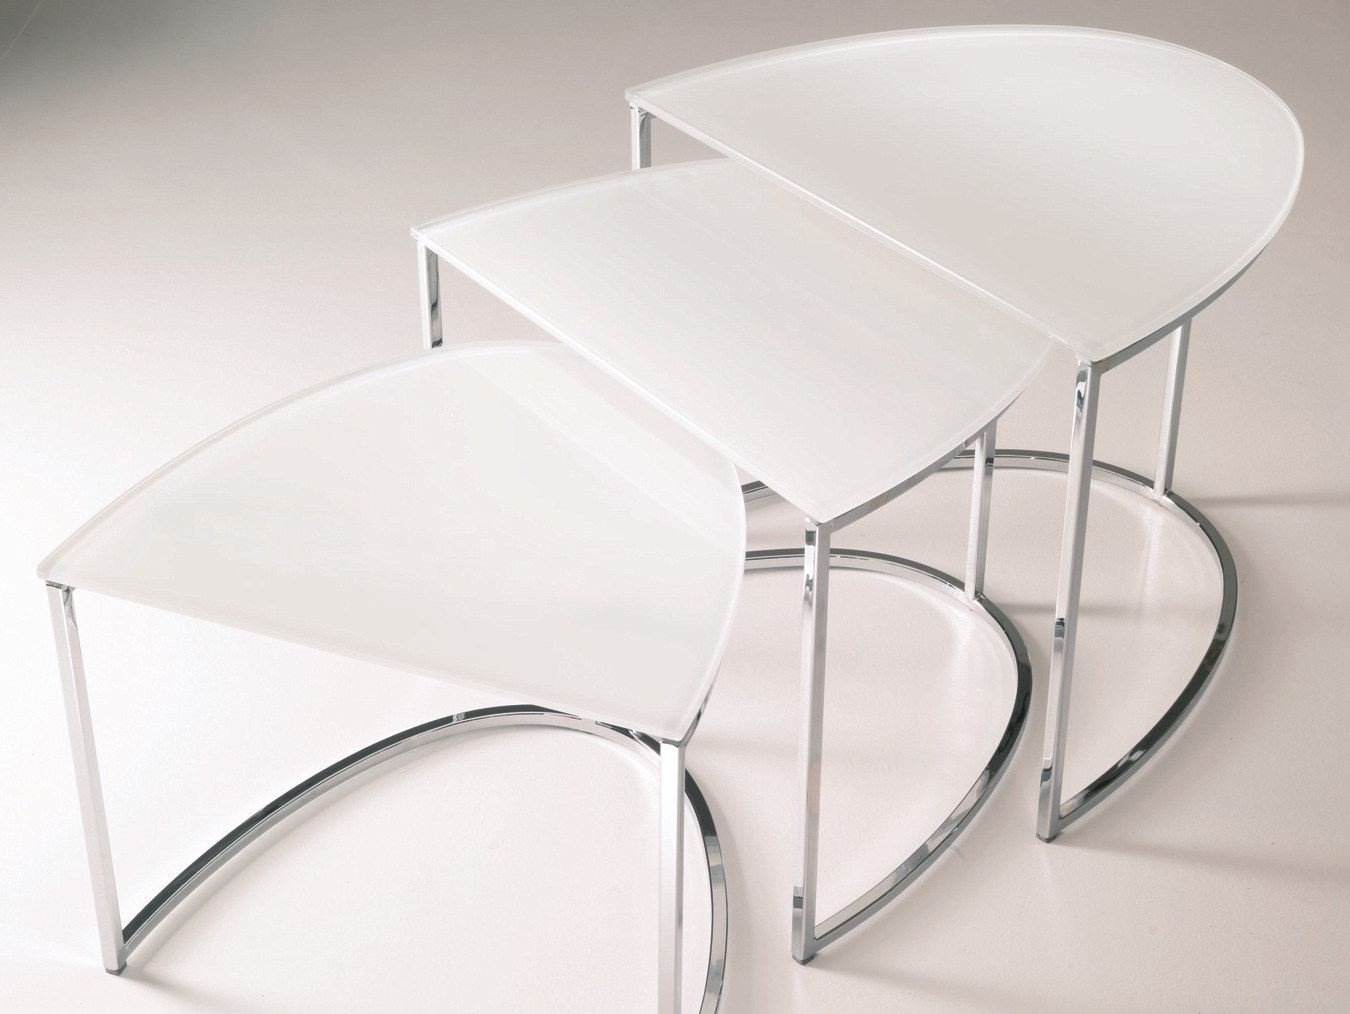 table basse modulable de salon hoppy collection tables. Black Bedroom Furniture Sets. Home Design Ideas